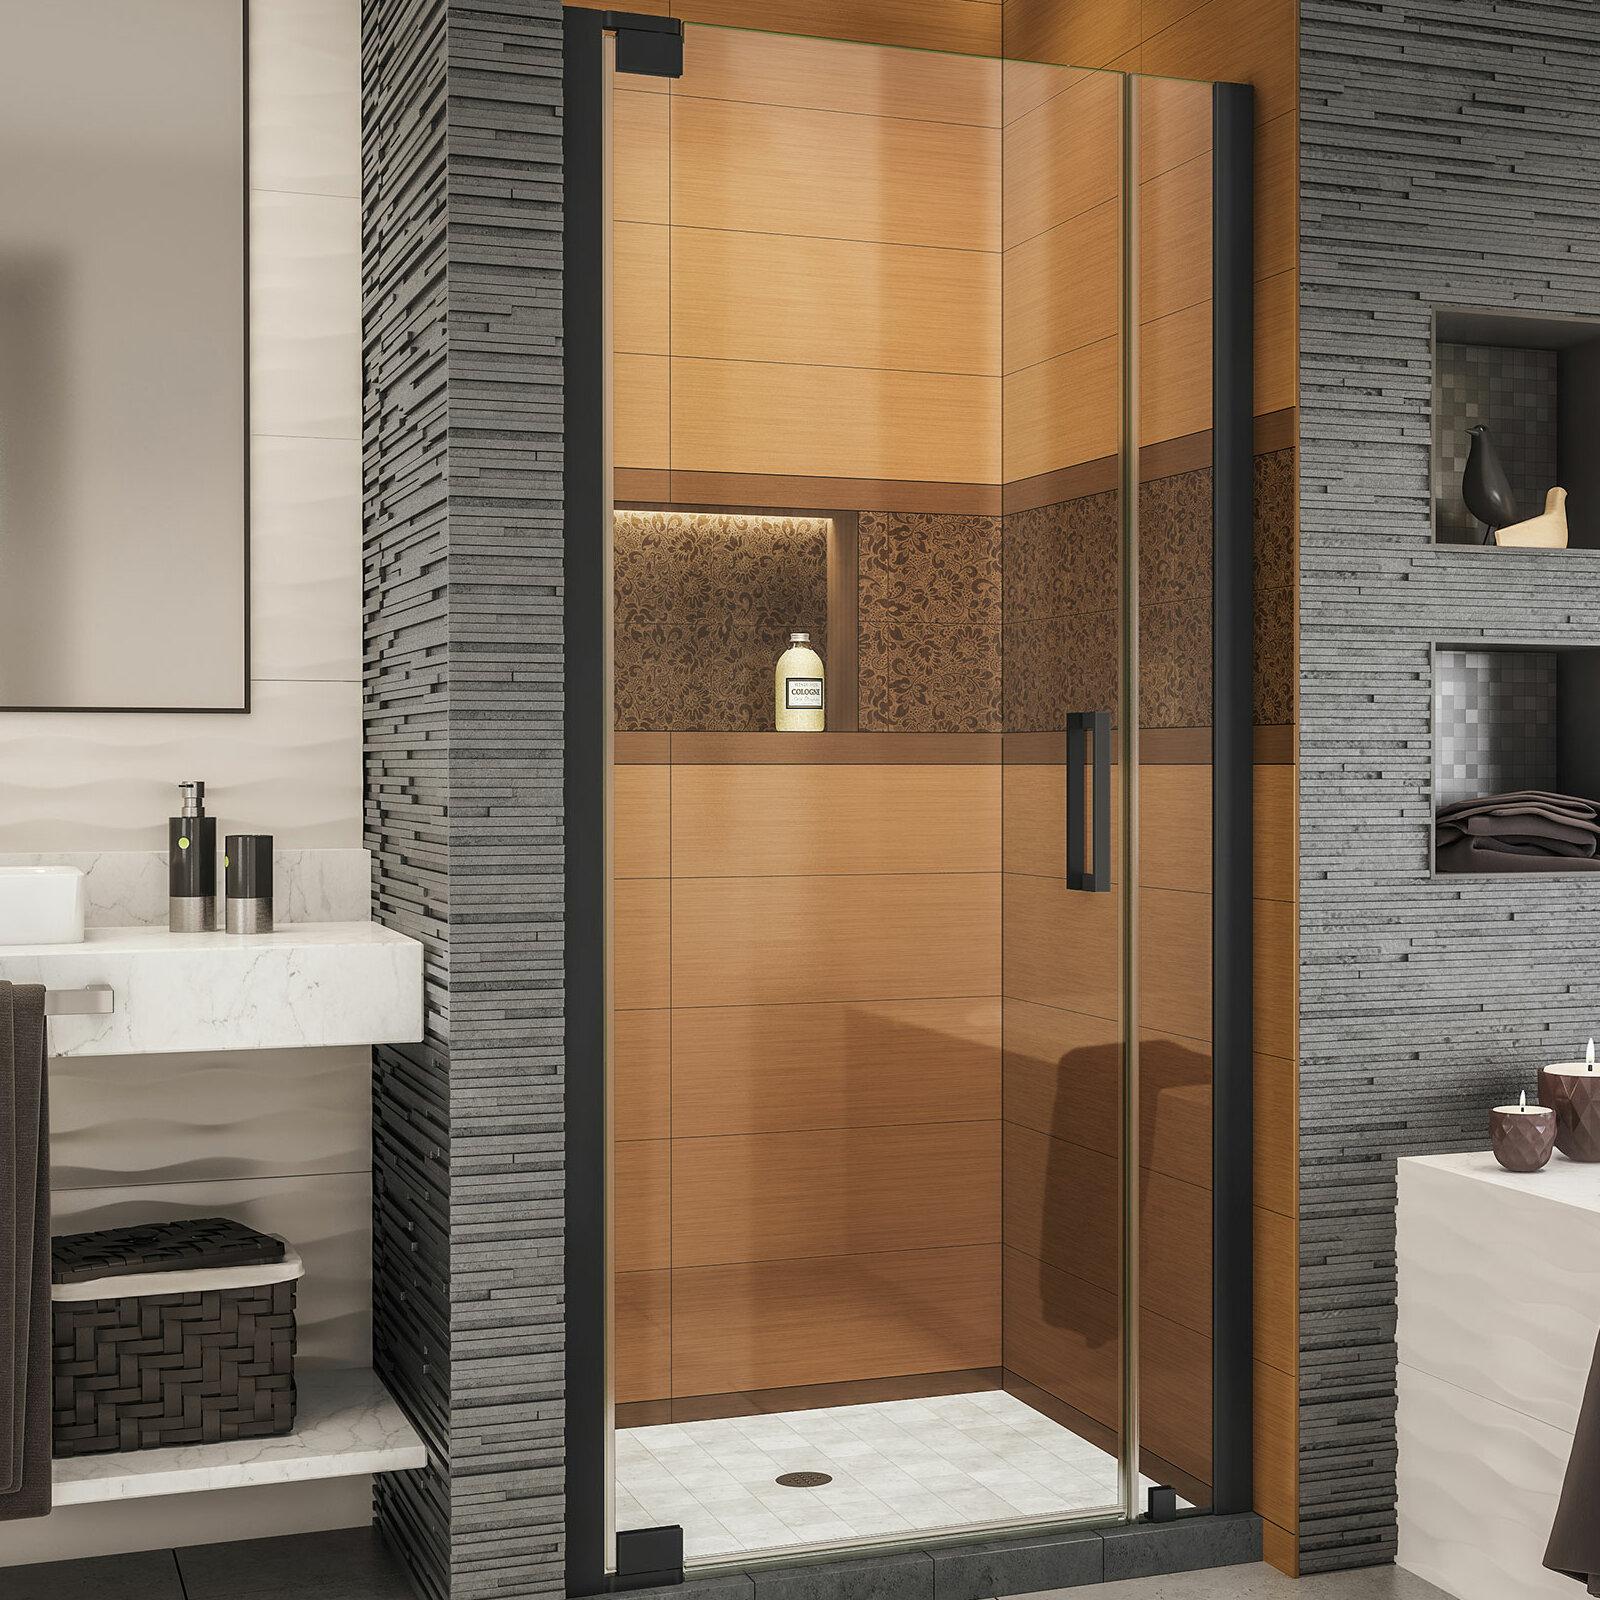 Elegance Ls 34 75 X 72 Pivot Frameless Shower Door With Clearmax Technology